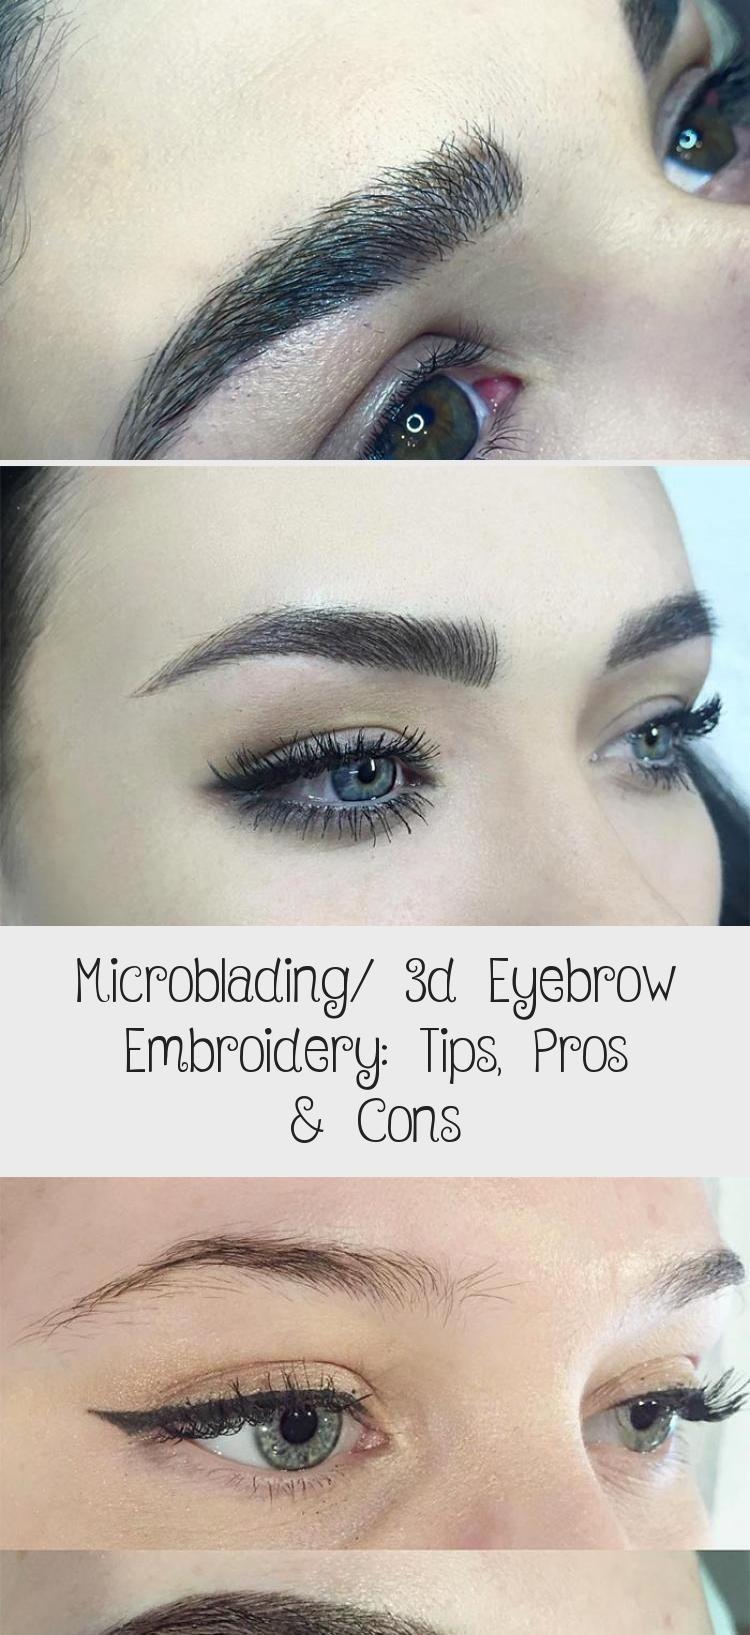 Microblading/ 3d Eyebrow Embroidery Tips, Pros & Cons